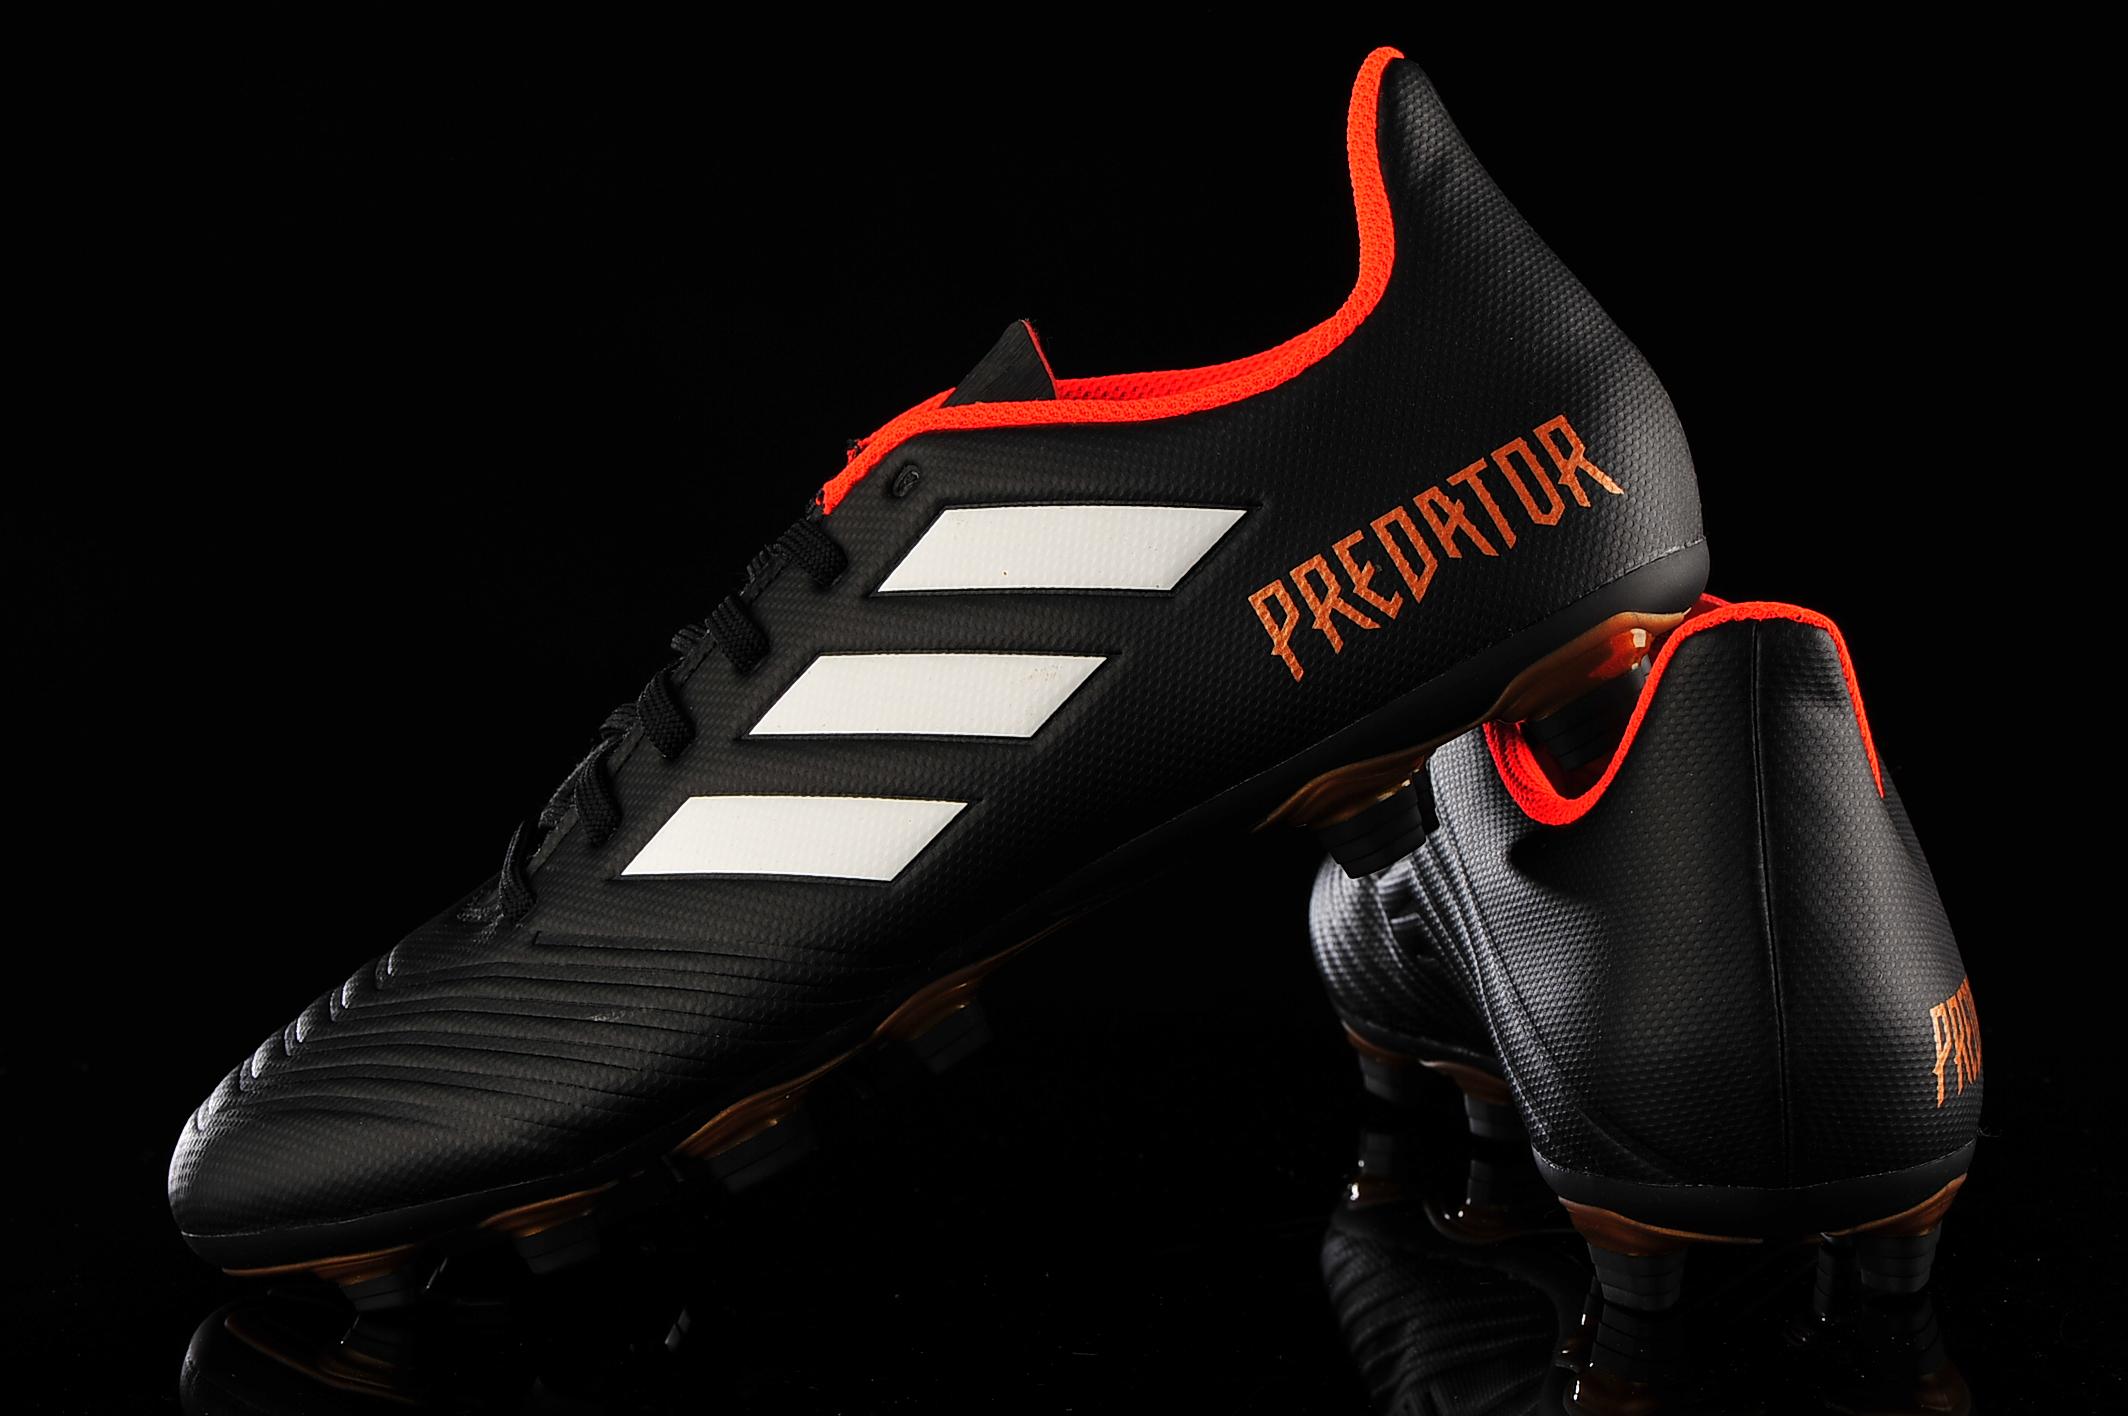 golpear maravilloso munición  adidas Predator 18.4 FxG CP9265   R-GOL.com - Football boots & equipment